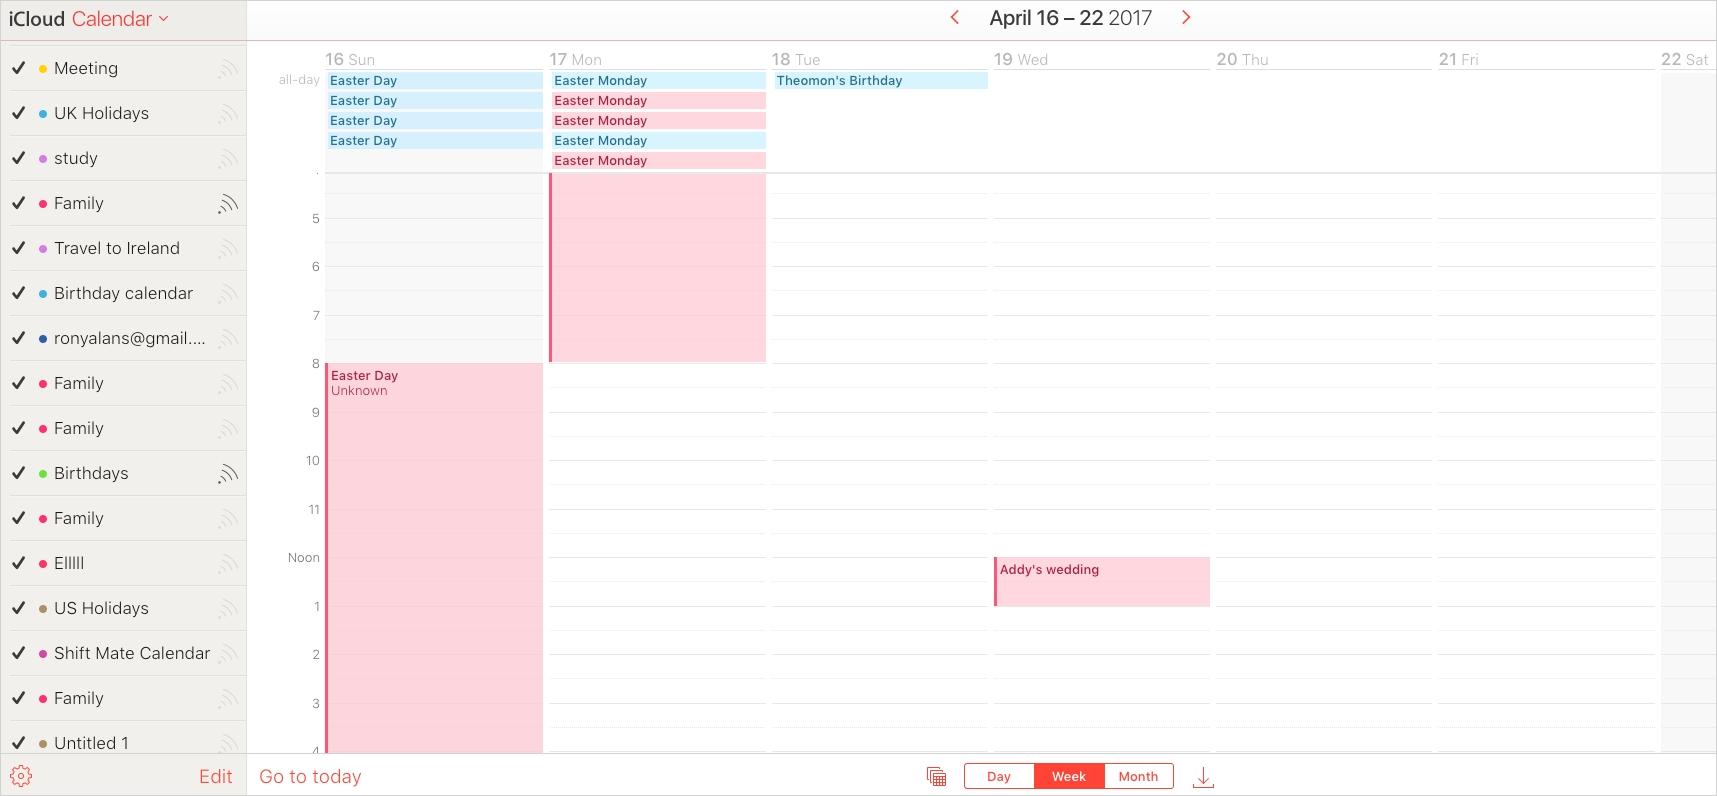 Godly Can U Print Icloud Calendar : Mini Calendar Template